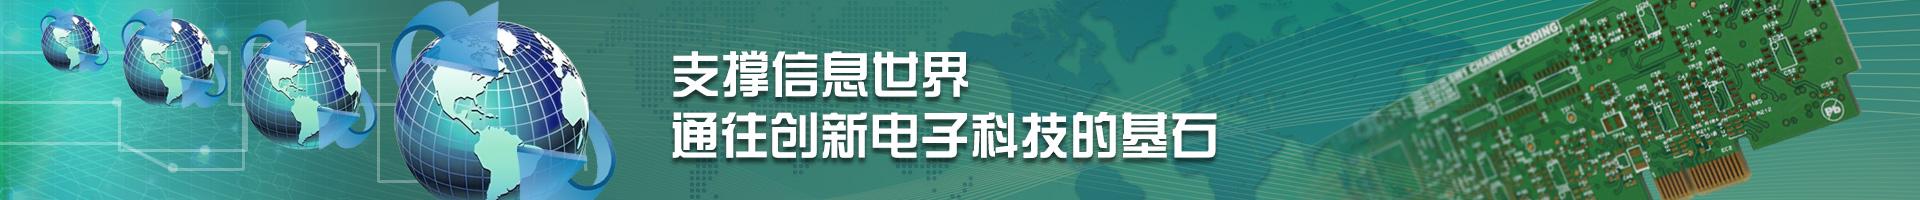 PCB线路板,电路板打样,PCB打样,PCB电路板,多层板打样,PCB价格,PCB生产厂商,深圳PCB厂商,厚铜板,盲埋孔板